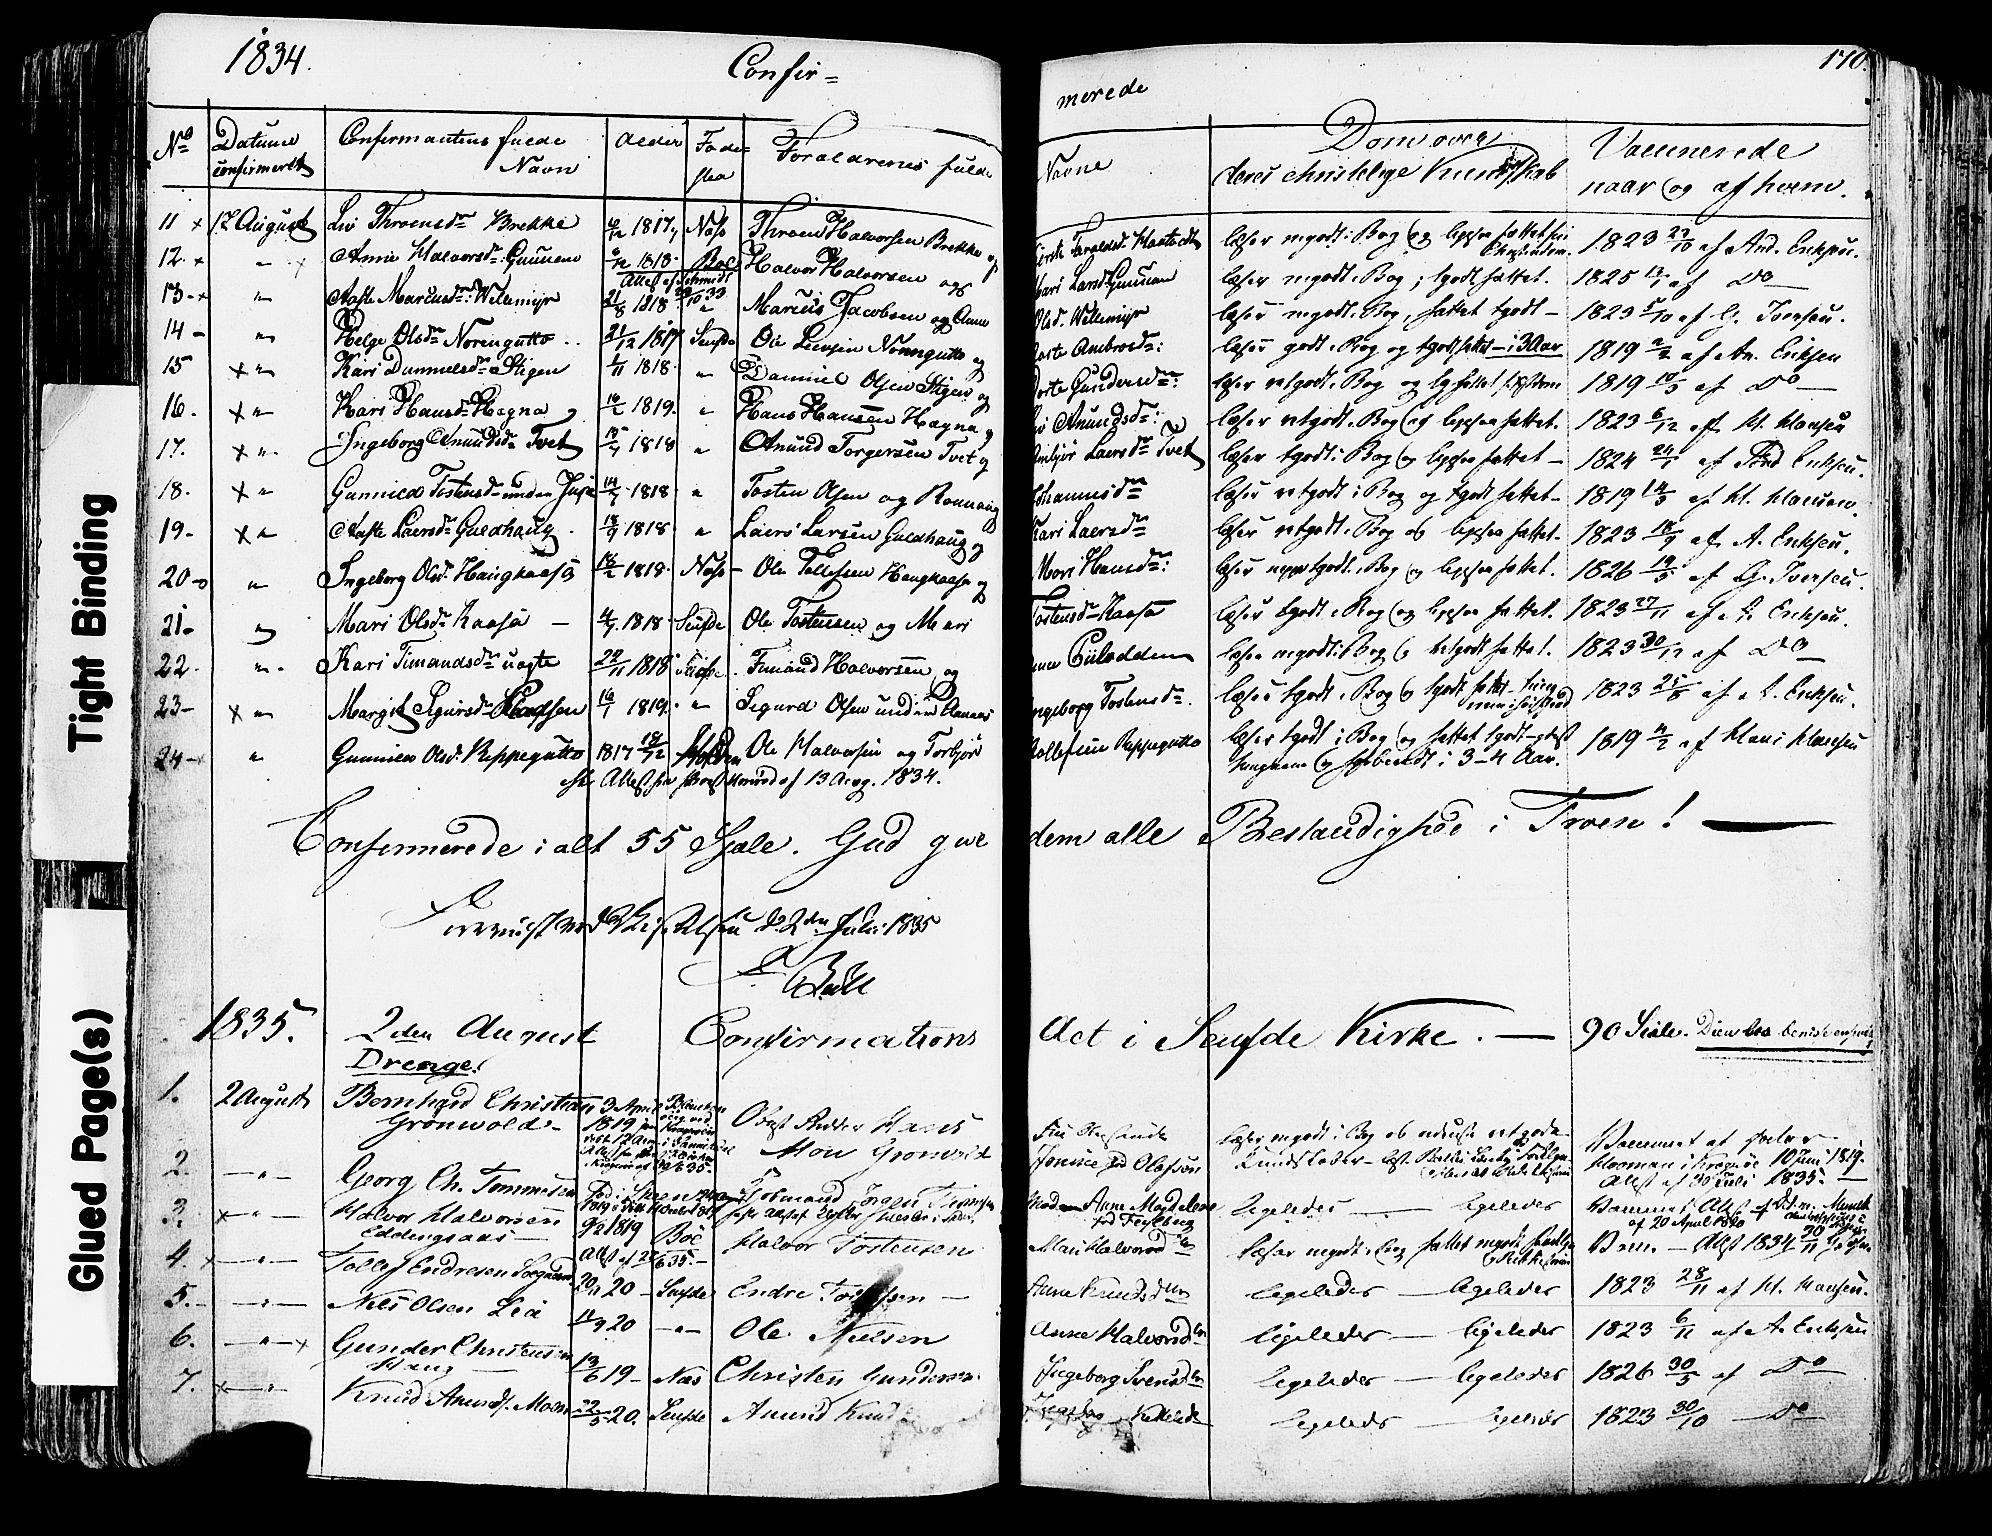 SAKO, Sauherad kirkebøker, F/Fa/L0006: Ministerialbok nr. I 6, 1827-1850, s. 170